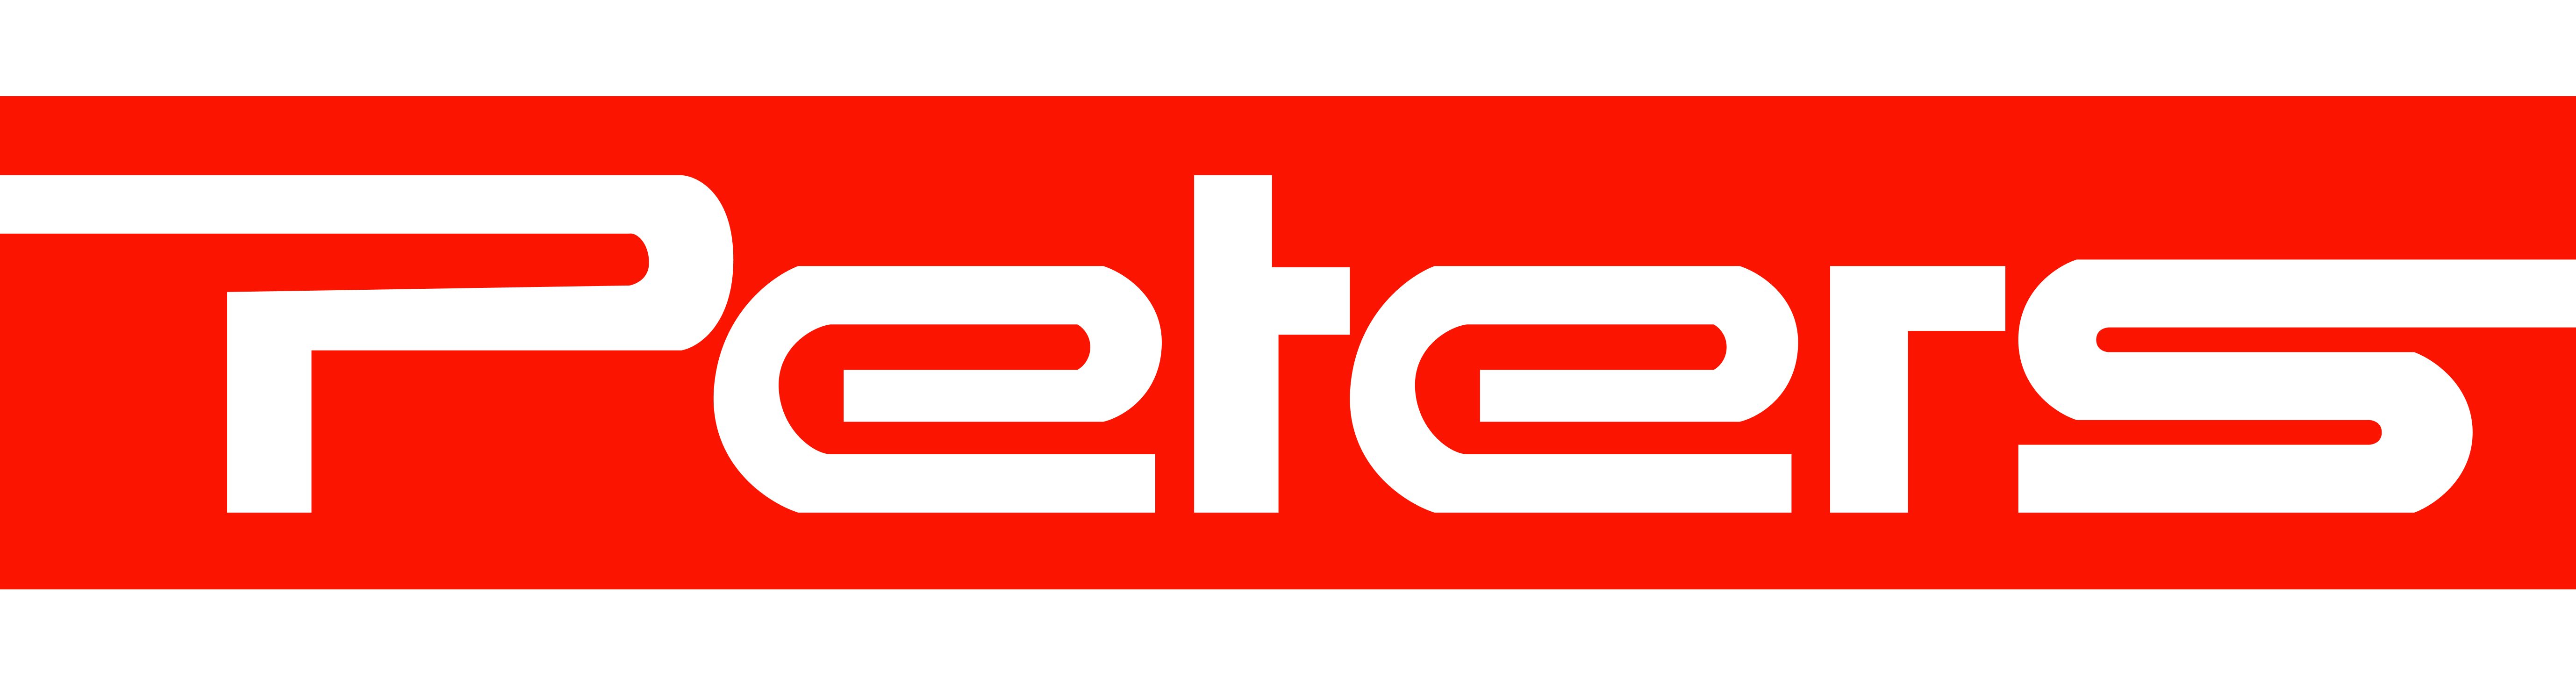 Peters GmbH kleines Logo